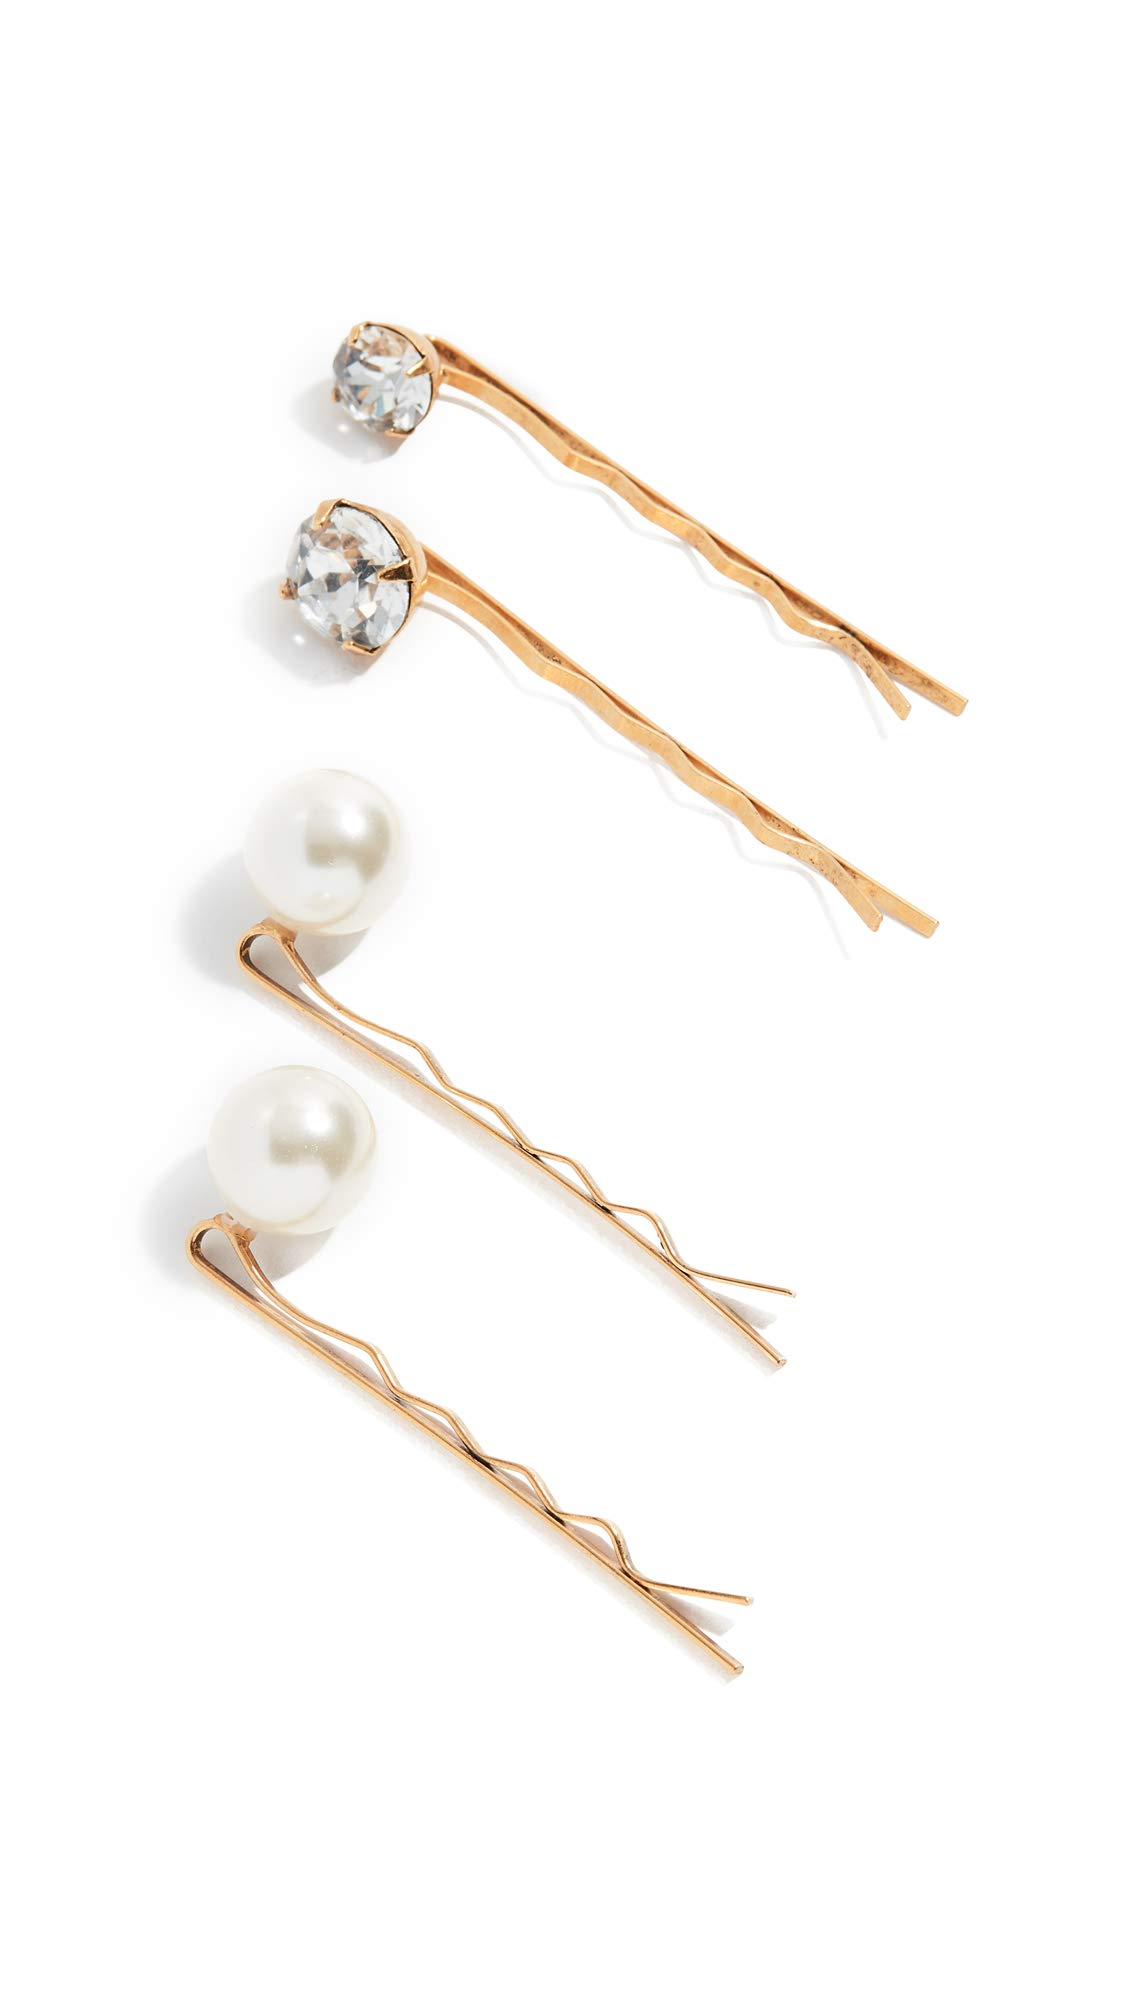 Jennifer Behr Women's Gigi Bobby Pins set of 4, Crystal Antique Gold, One Size by Jennifer Behr